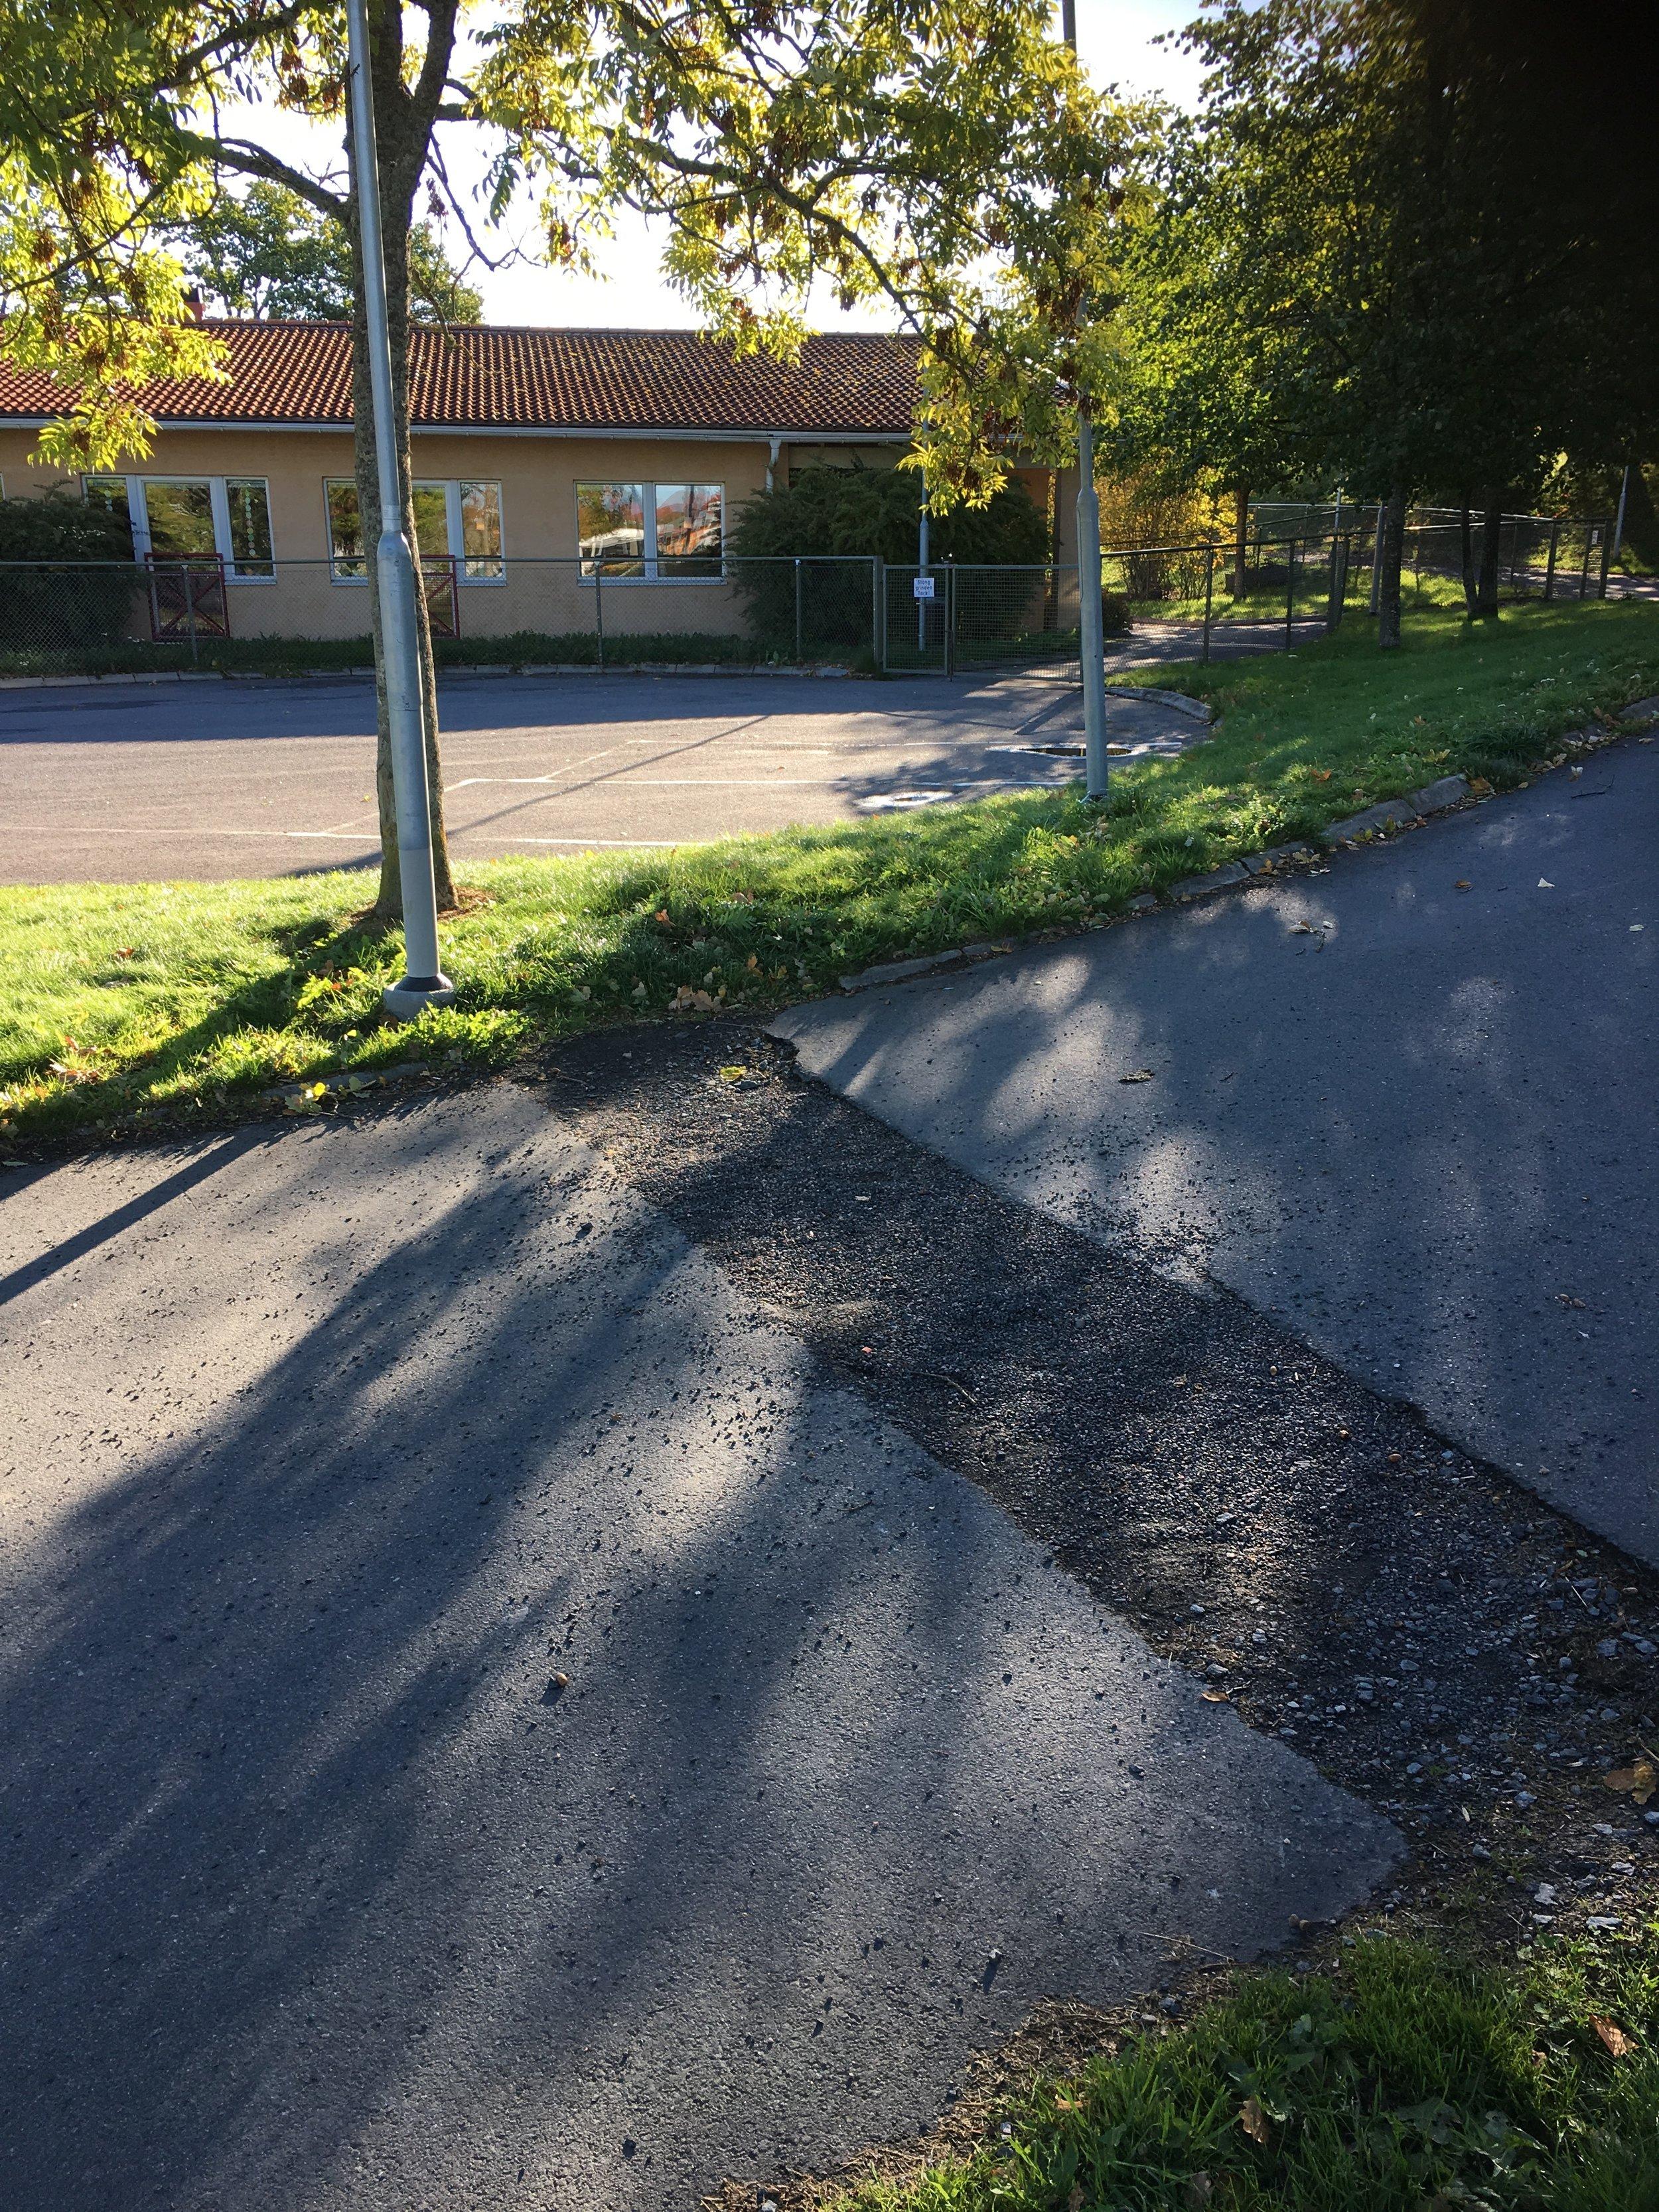 Asfalt i Småland - Asfaltslagning.JPG